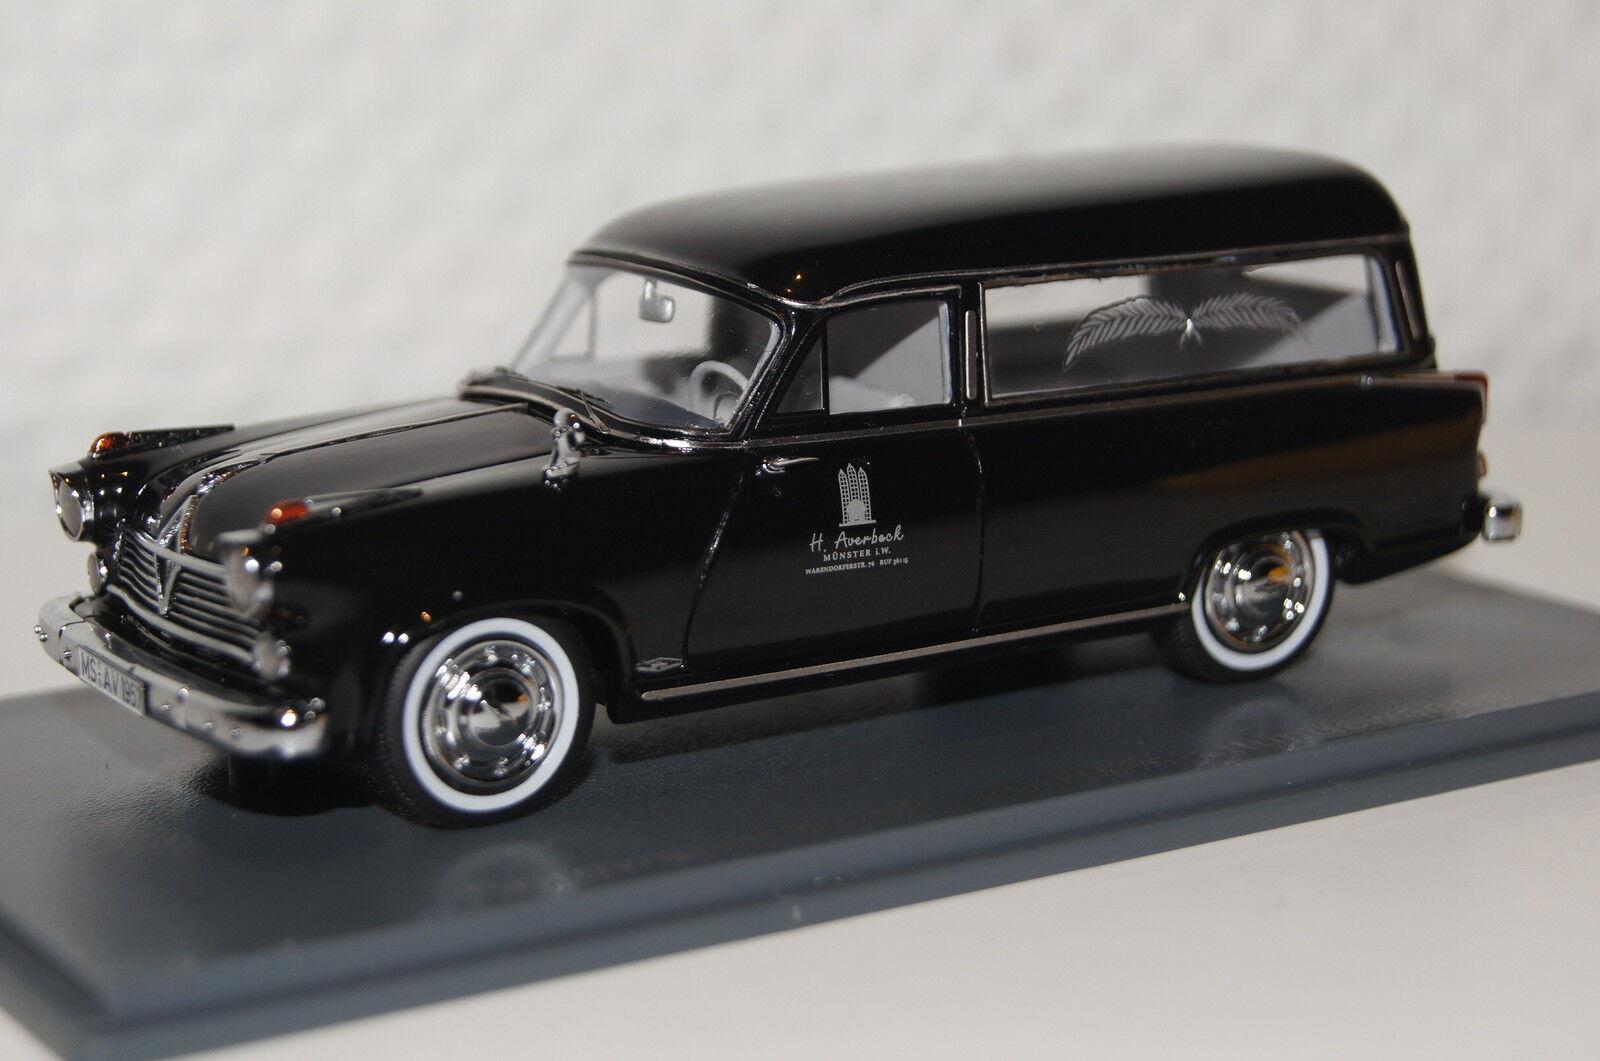 BORGWARD HANSA 2400 inhumation voiture Noir 1 43 Neo NOUVEAU & OVP 49520